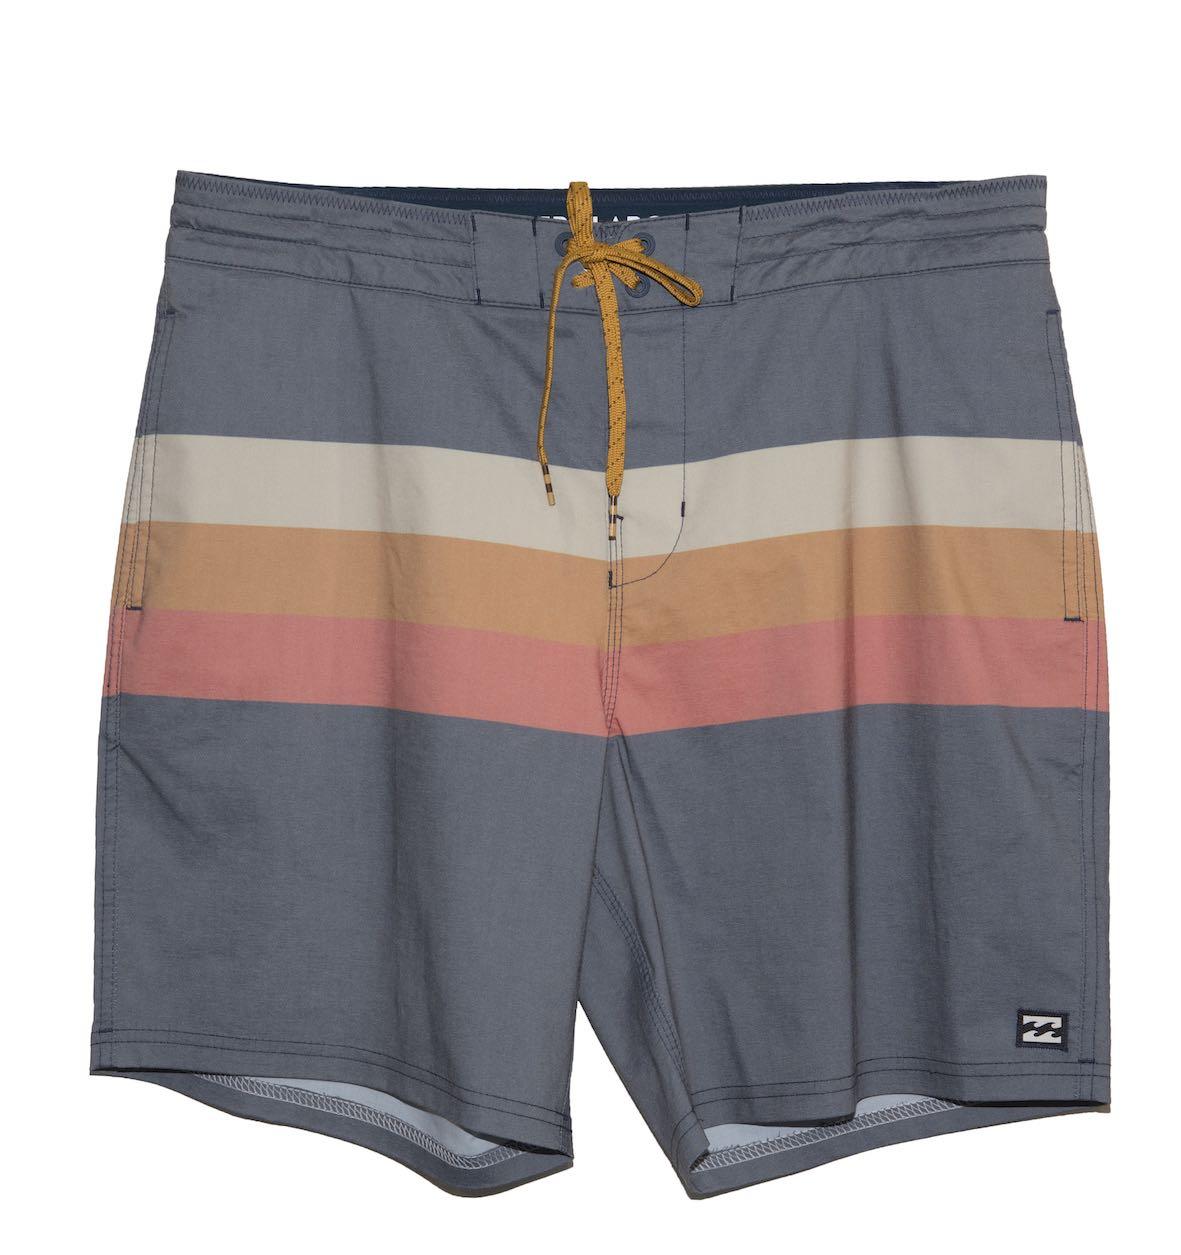 Billabong Momentum LT Boardshorts